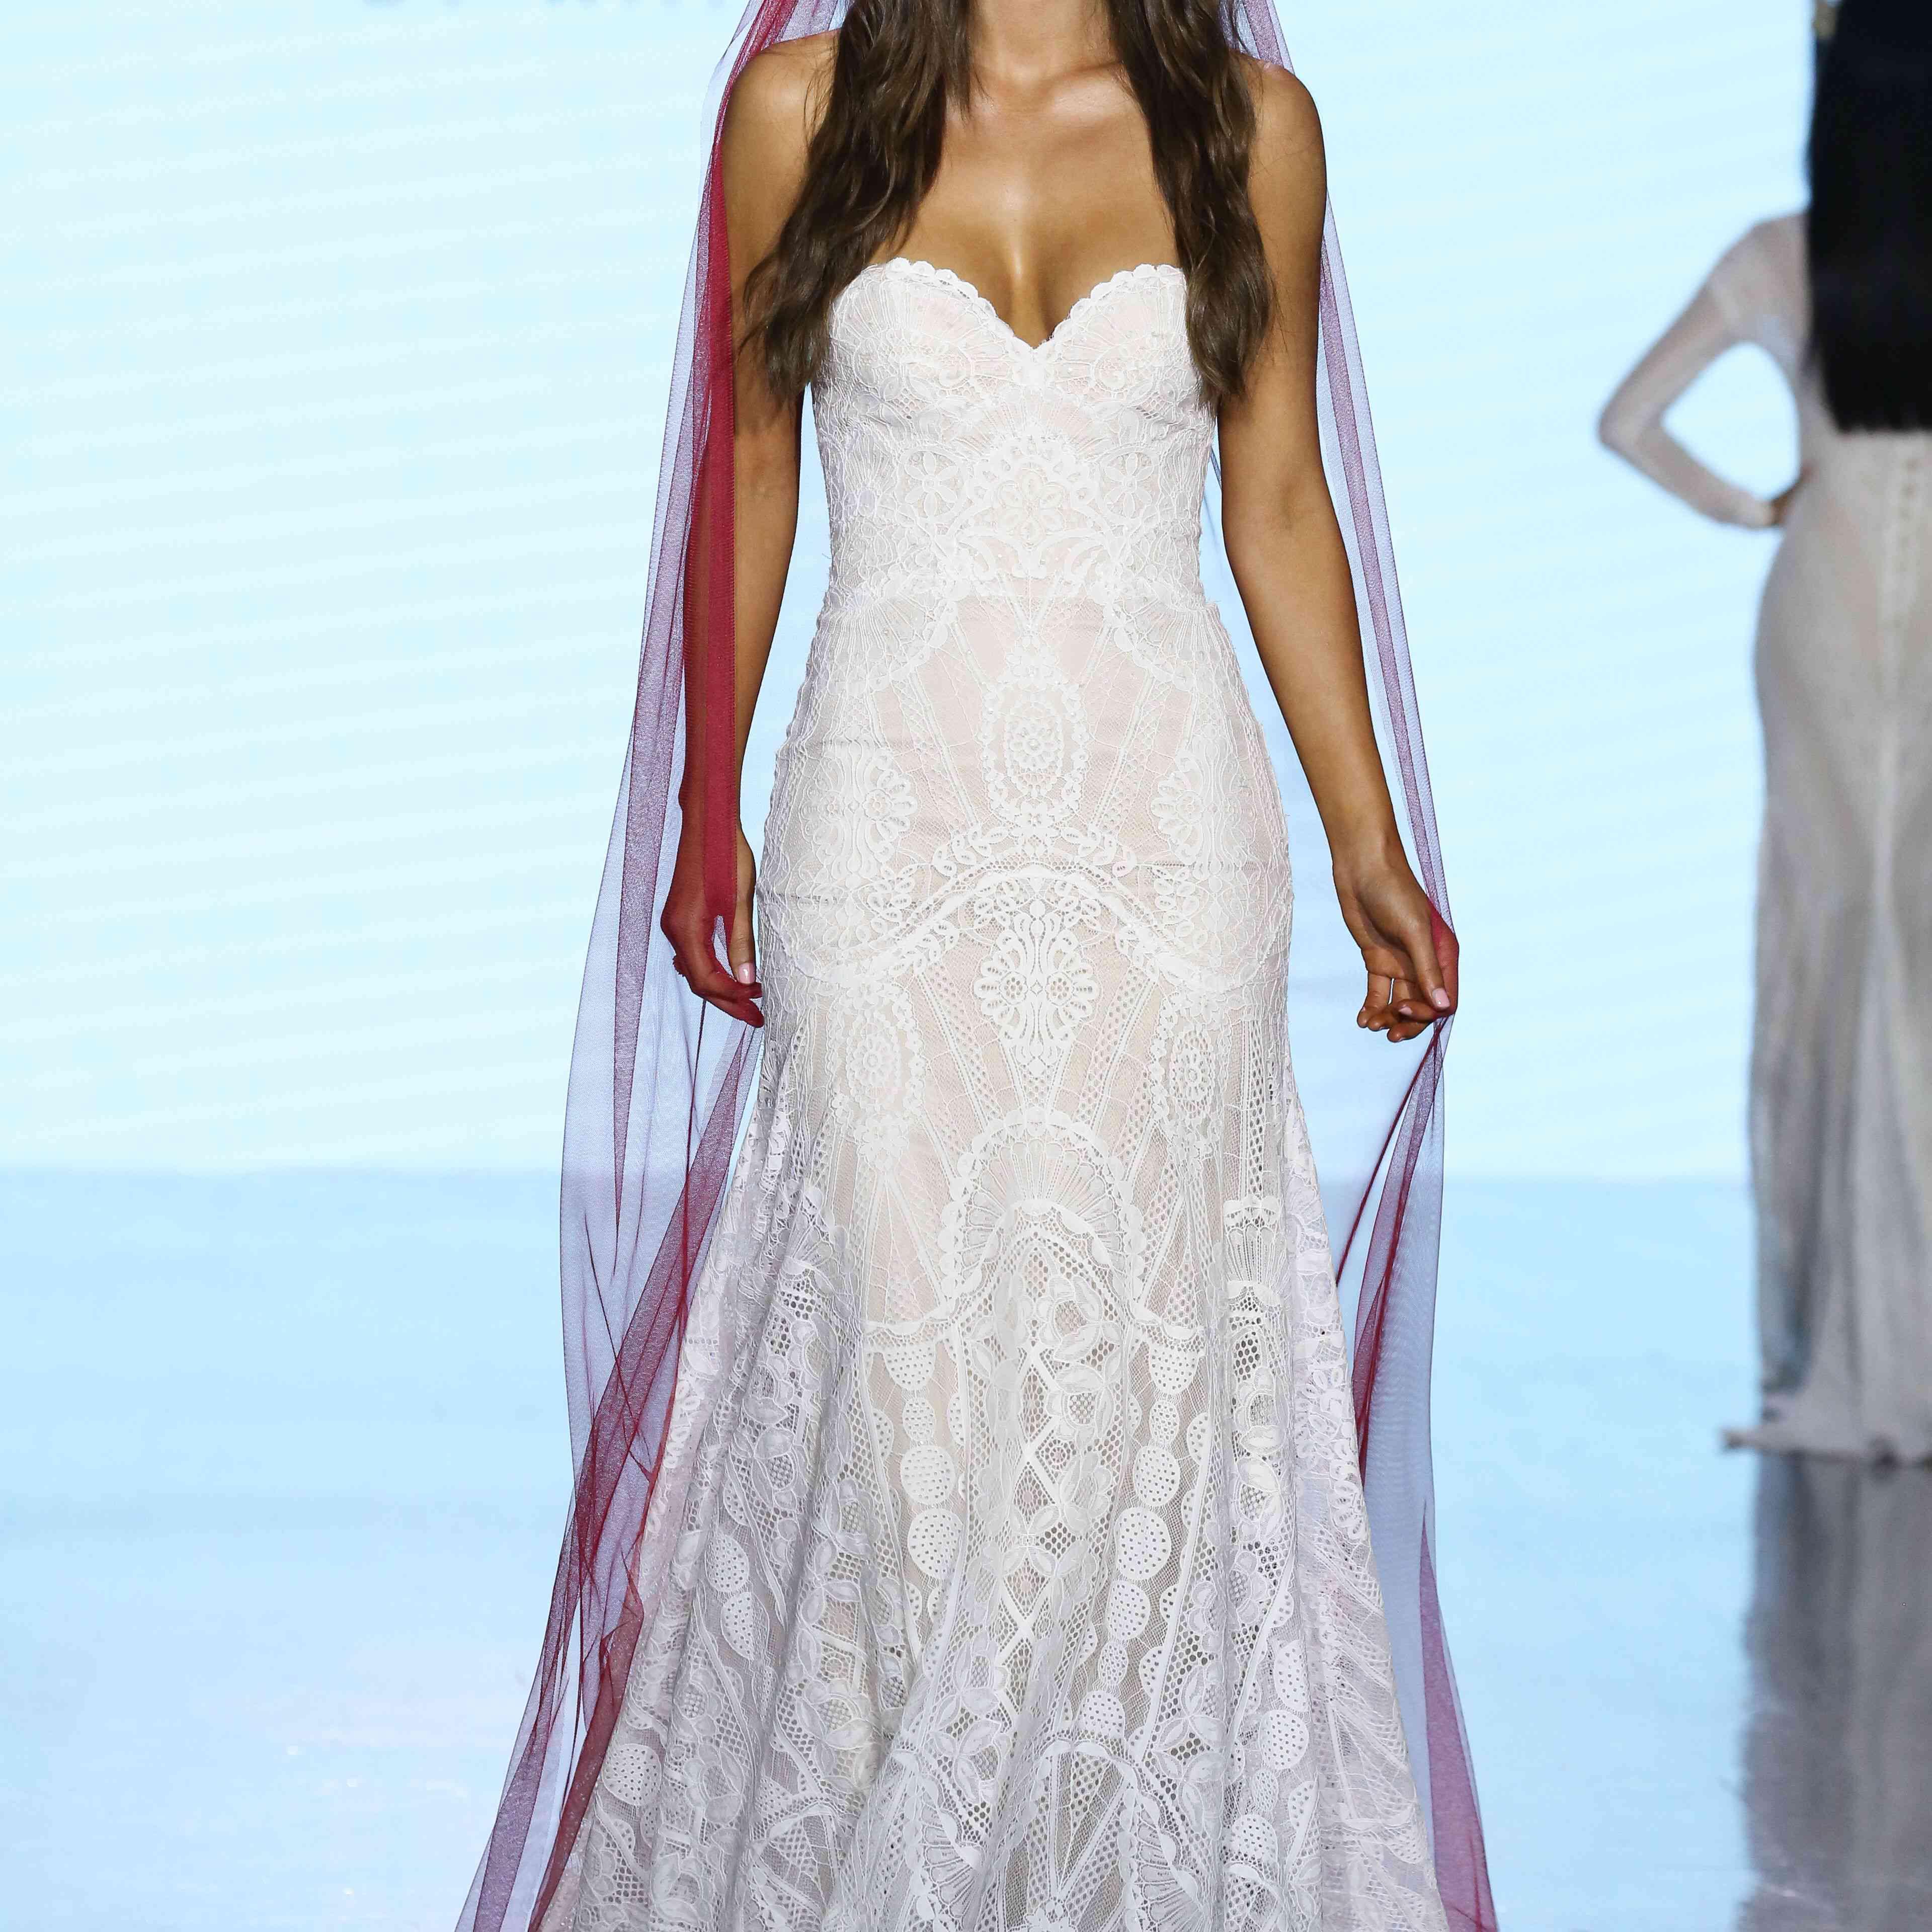 Model in strapless geometric lace wedding dress